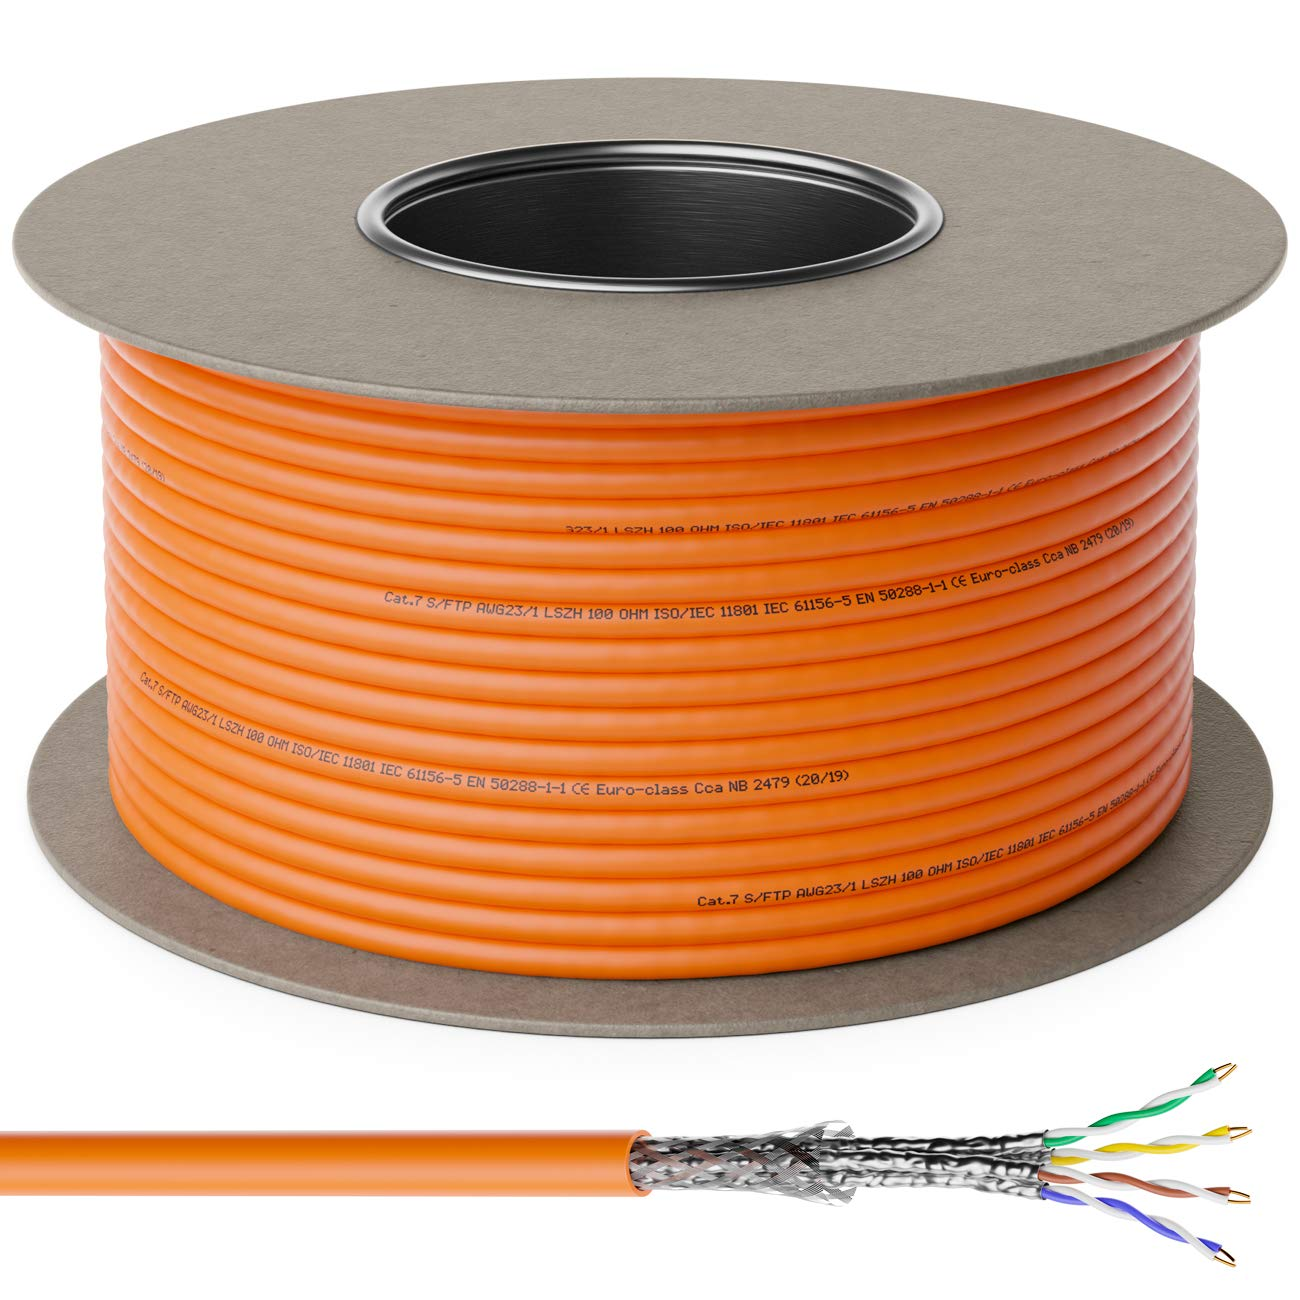 deleyCON 50m Cat.7 Cable de Instalaci/ón Cobre R/ígido S//FTP PIMF Cable de Red Cable de Instalaci/ón Cable LAN Cable de Ethernet Cable de Datos Gigabit CAT7 10Gbit 1000MHz LSZH Libre de Hal/ógenos DOP